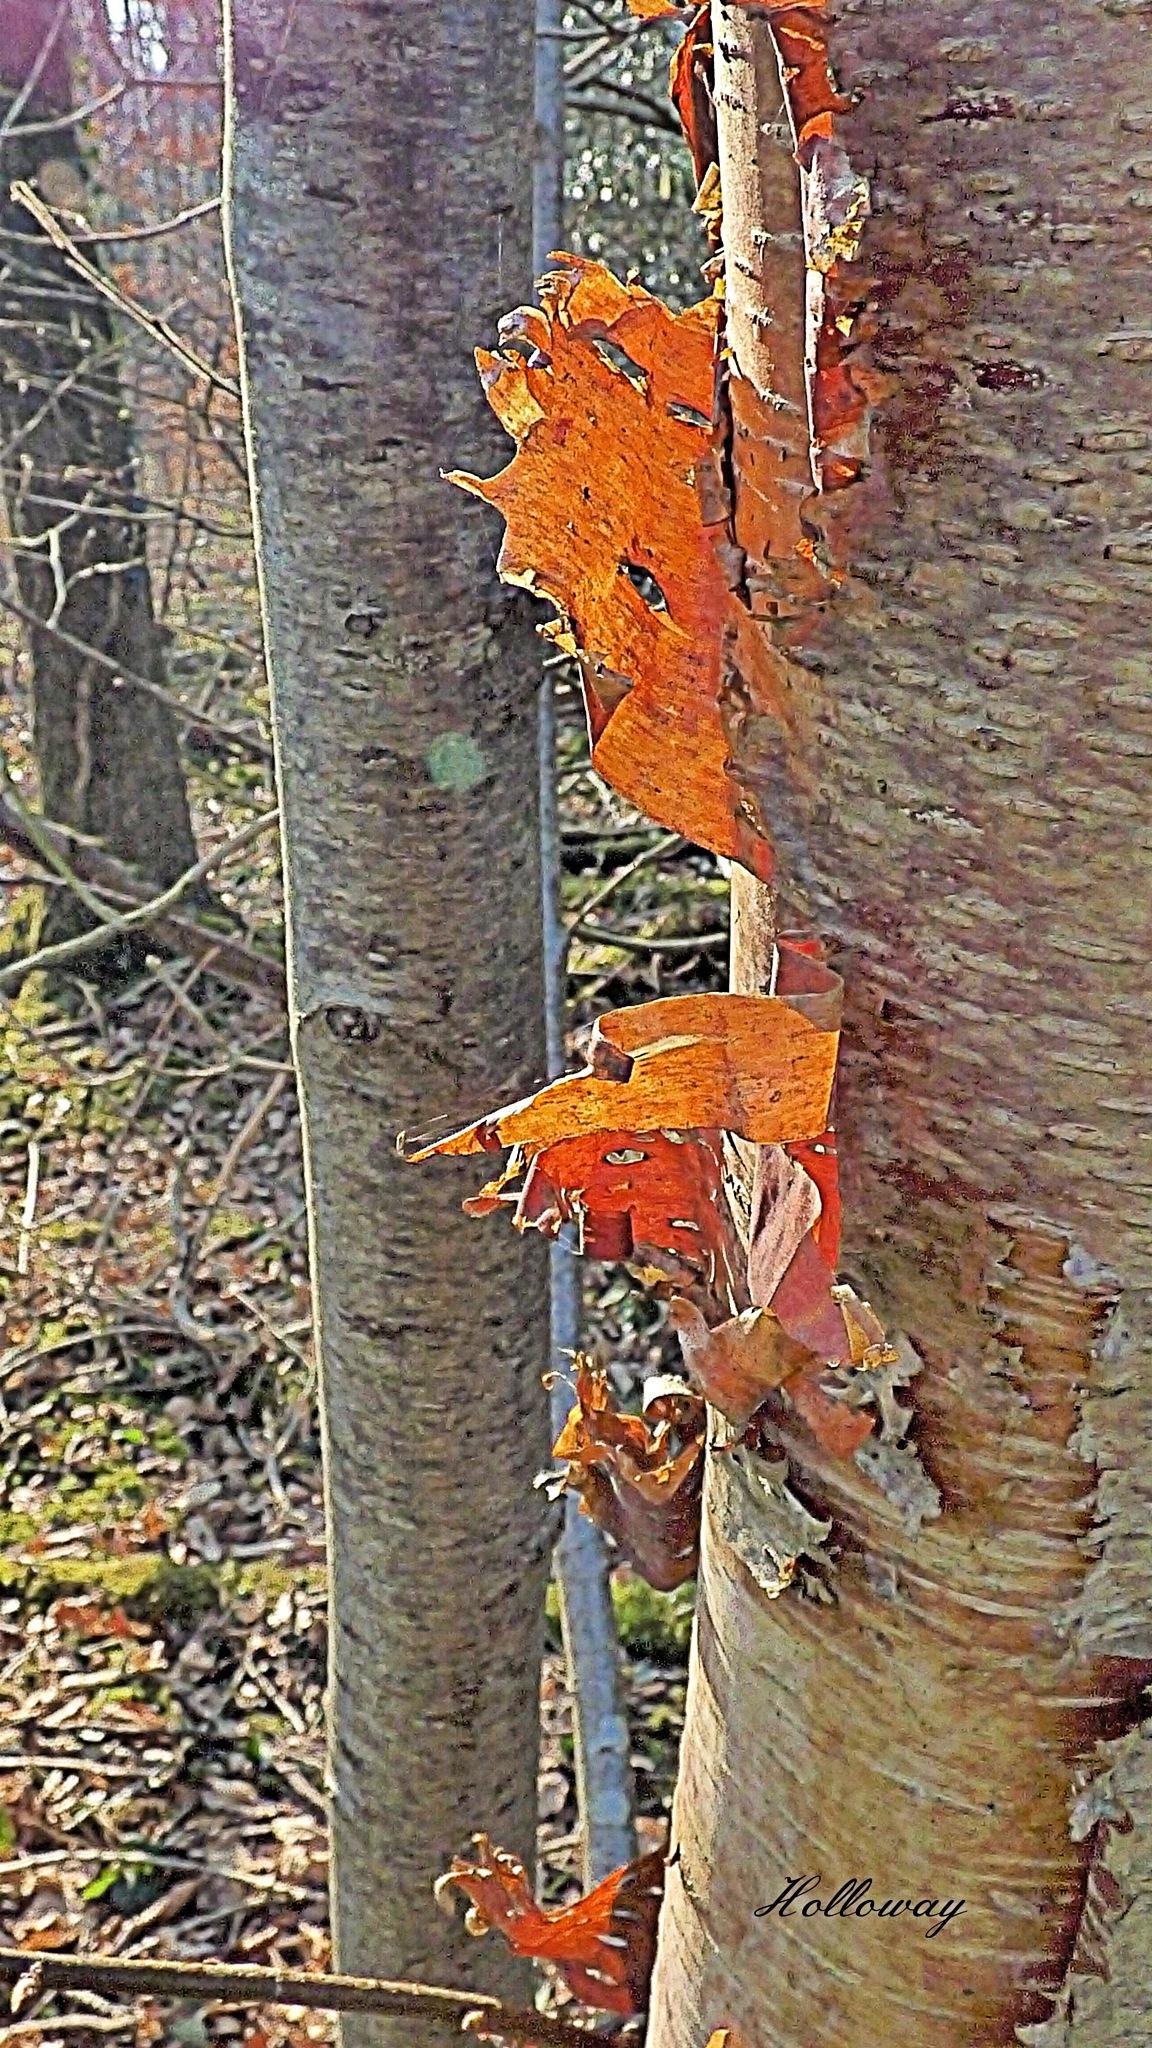 Stripping the Birch by John Holloway